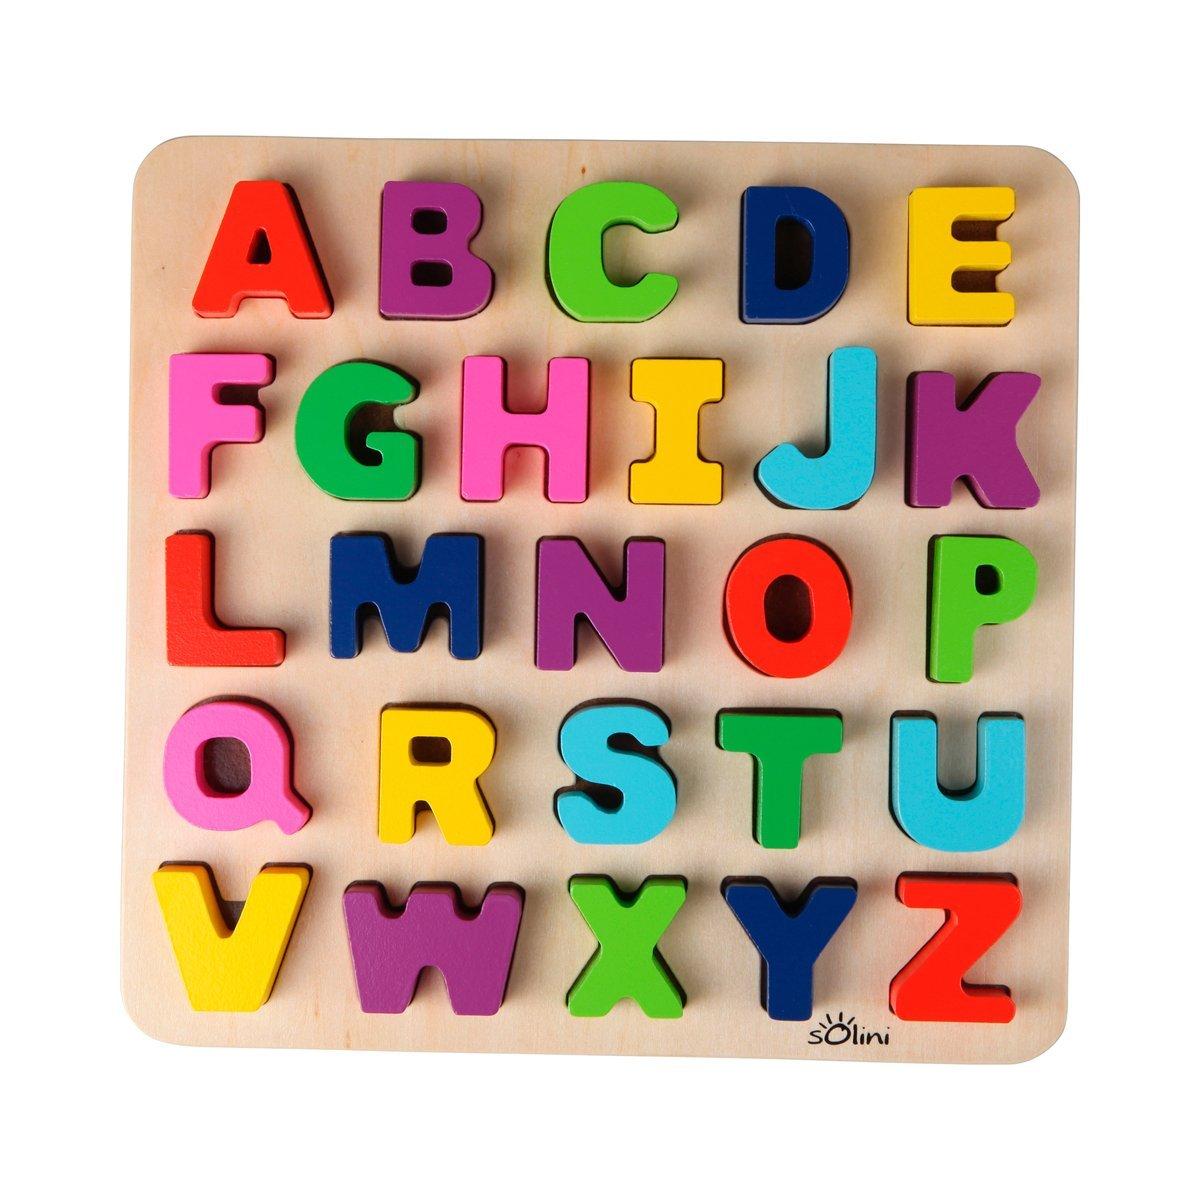 ab 18 Monate bunt neu Puzzle Spiele Holzspielzeug solini ABC Buchstaben 26-tlg Spielzeug Baby